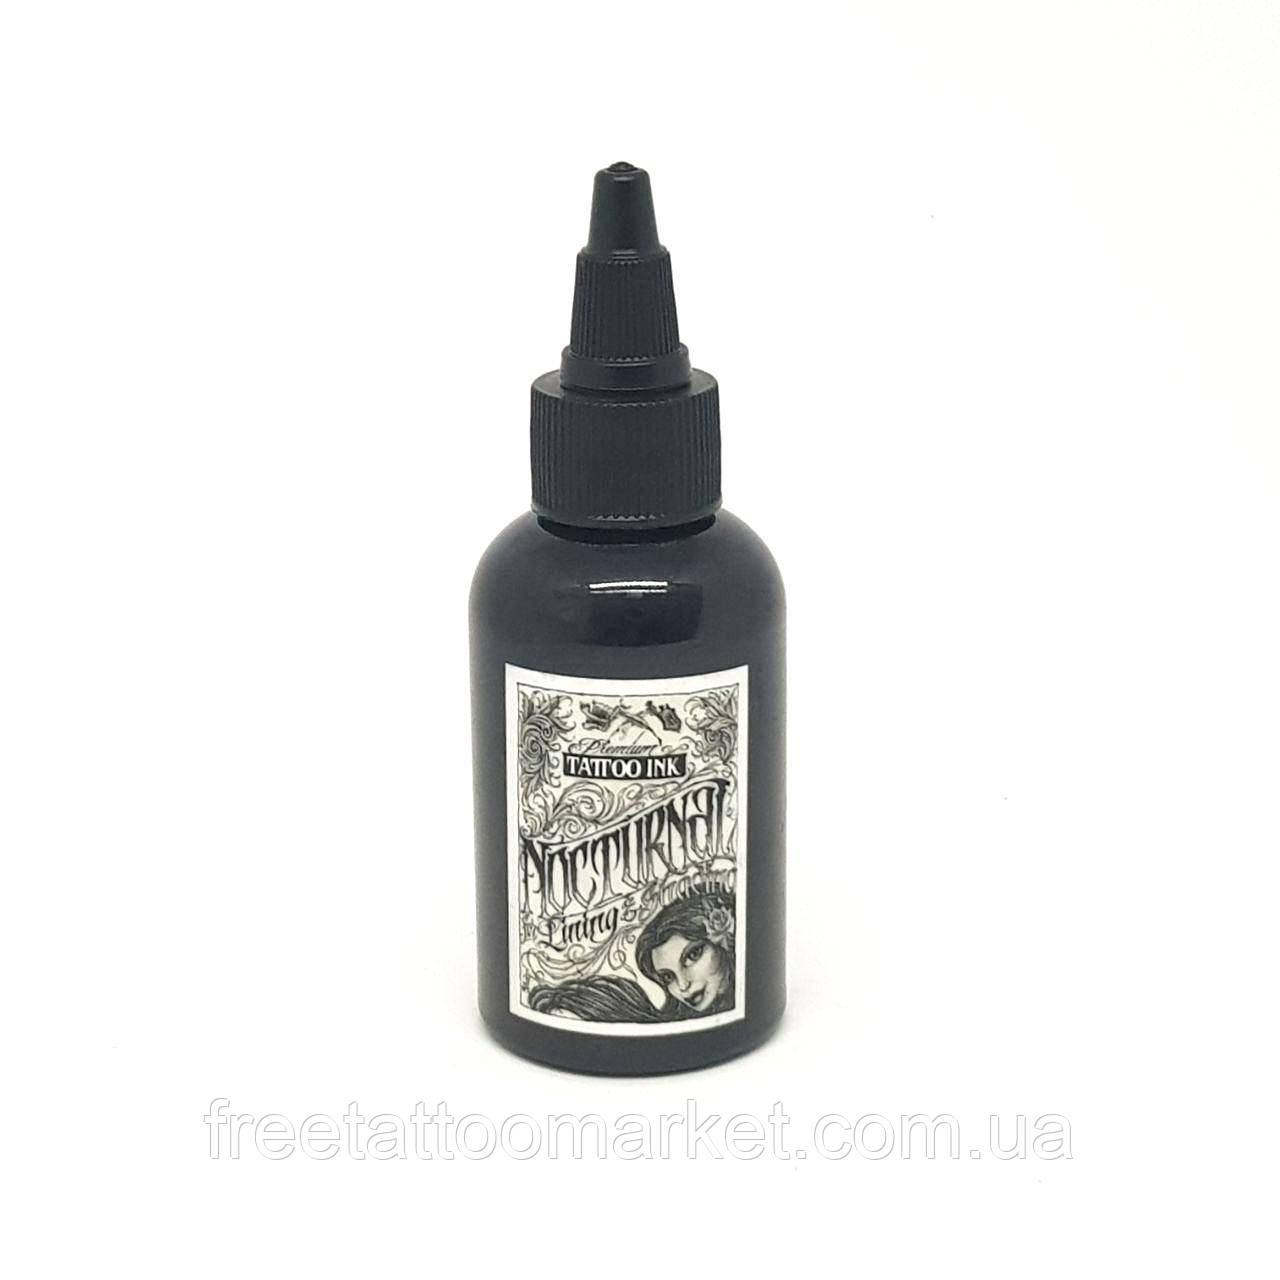 Краска для тату Nocturnal Tattoo Ink Lining and Shading 2 унции (60 мл)